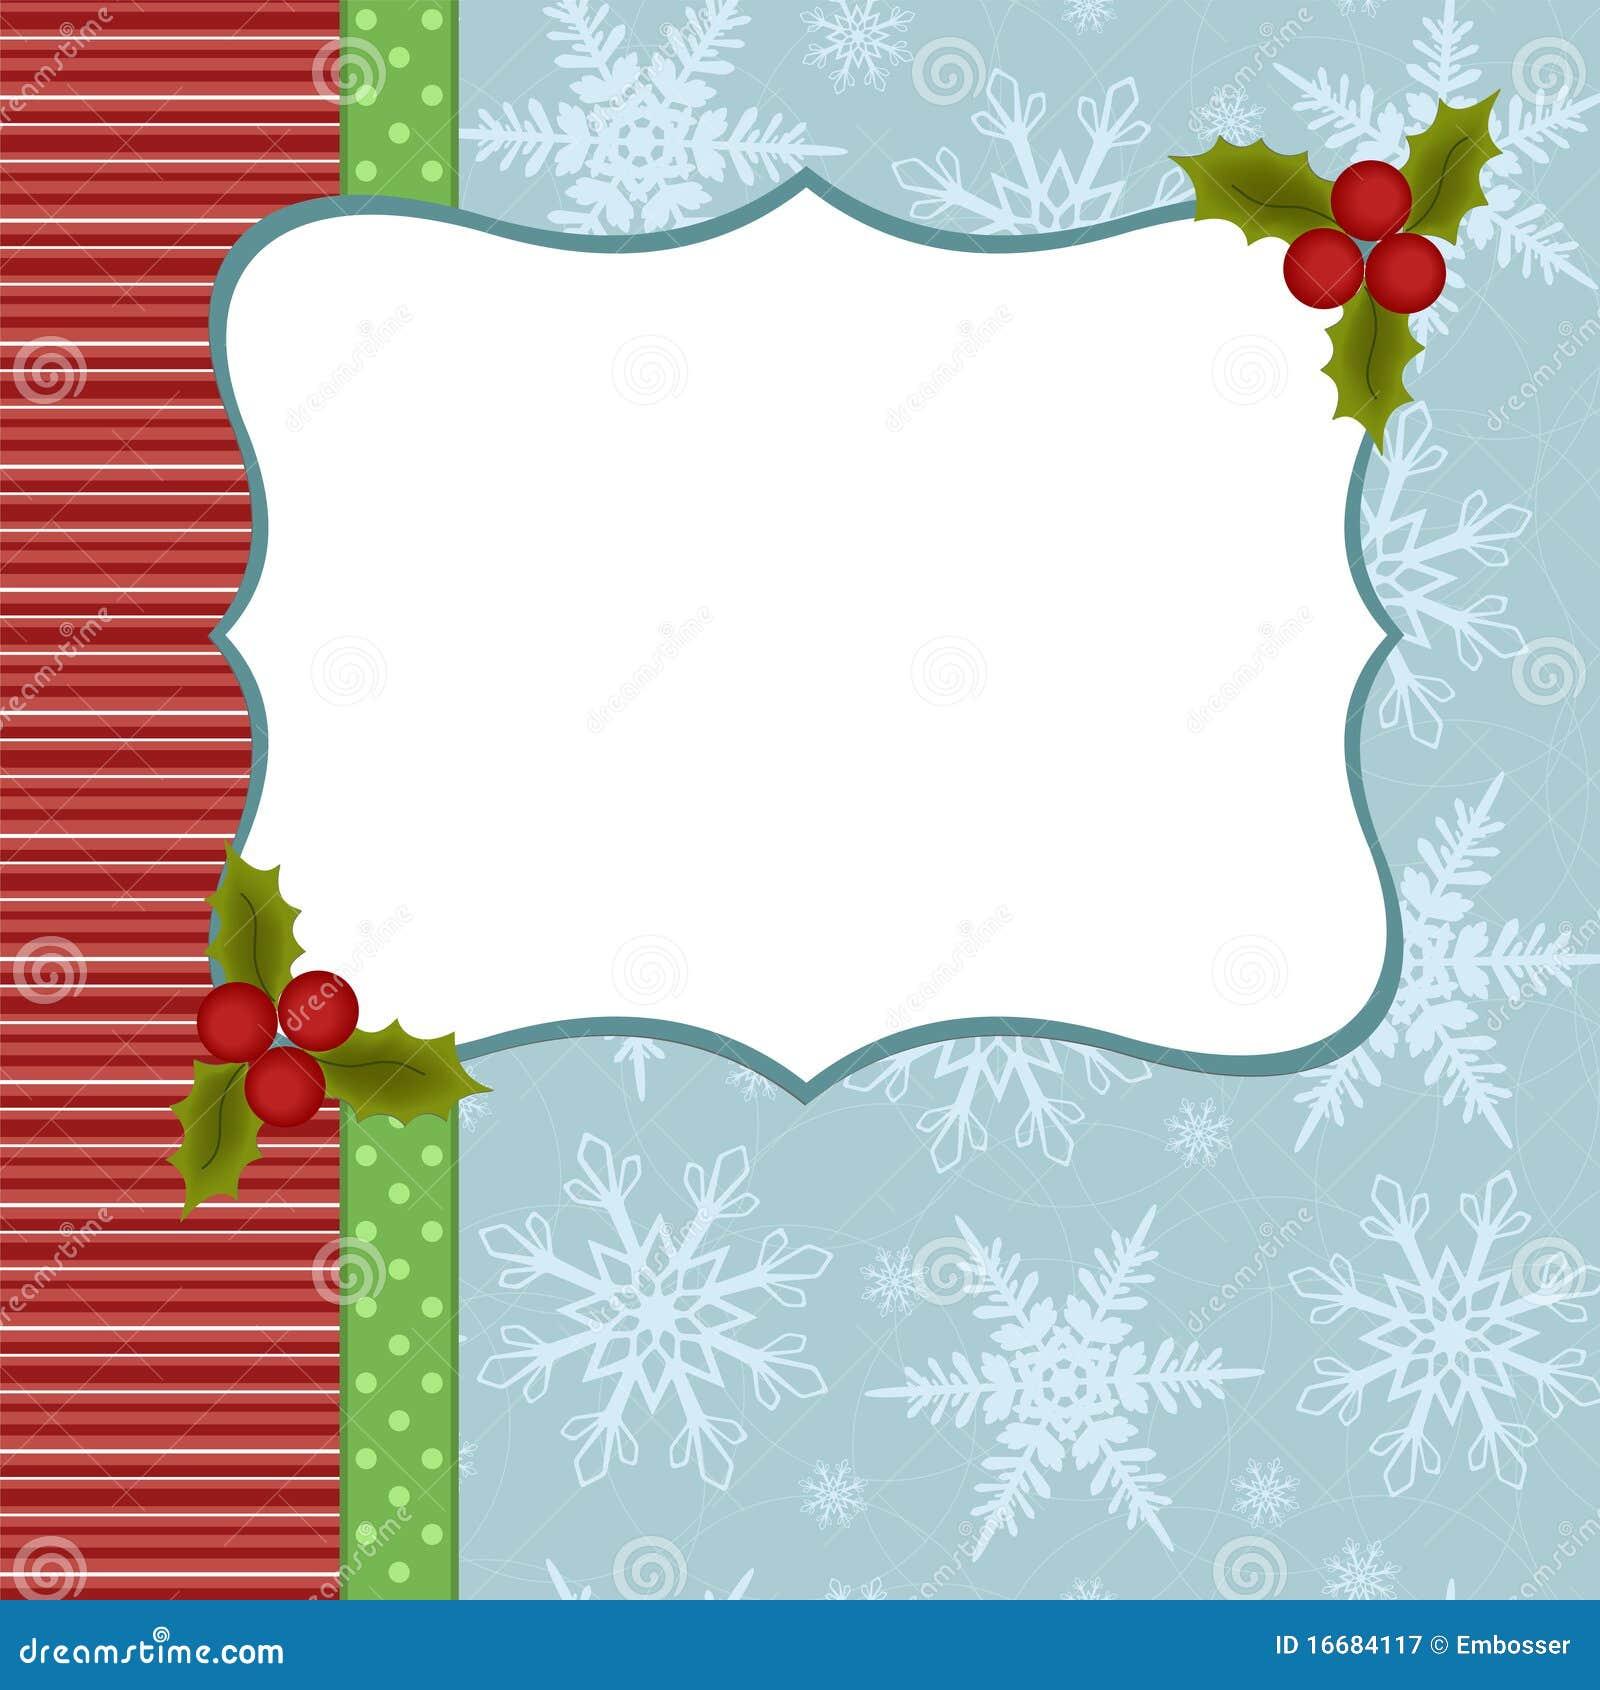 Blank card template solarfm blank card template m4hsunfo